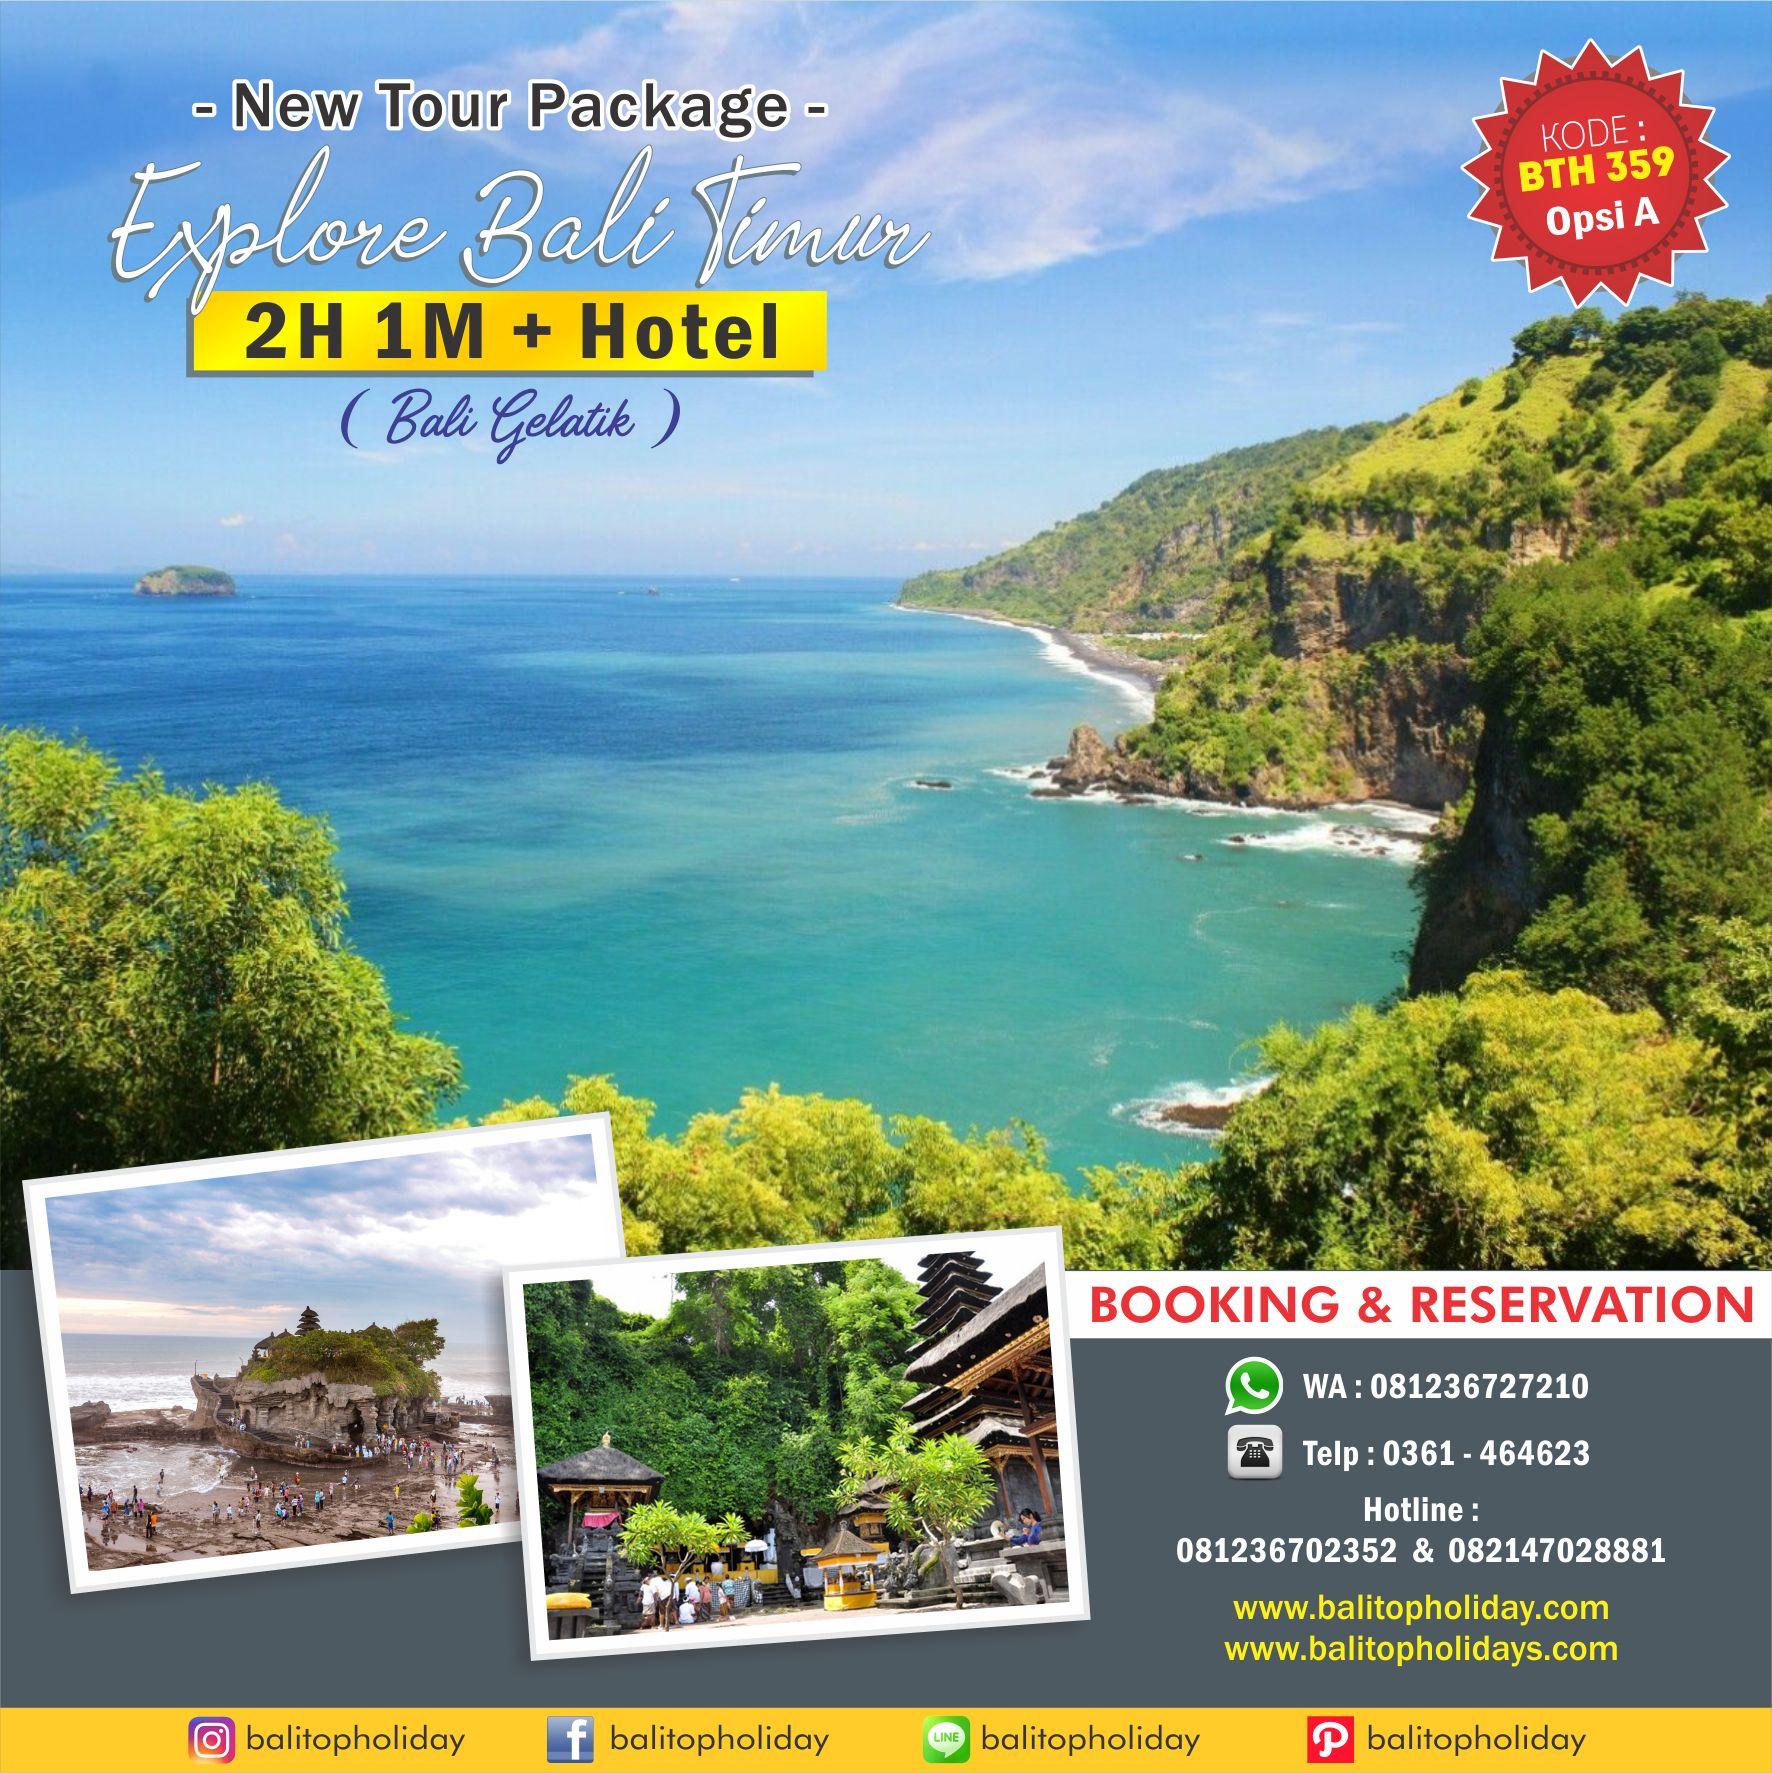 Paket Tour 2 Hari 1 Malam Explore Bali Timur